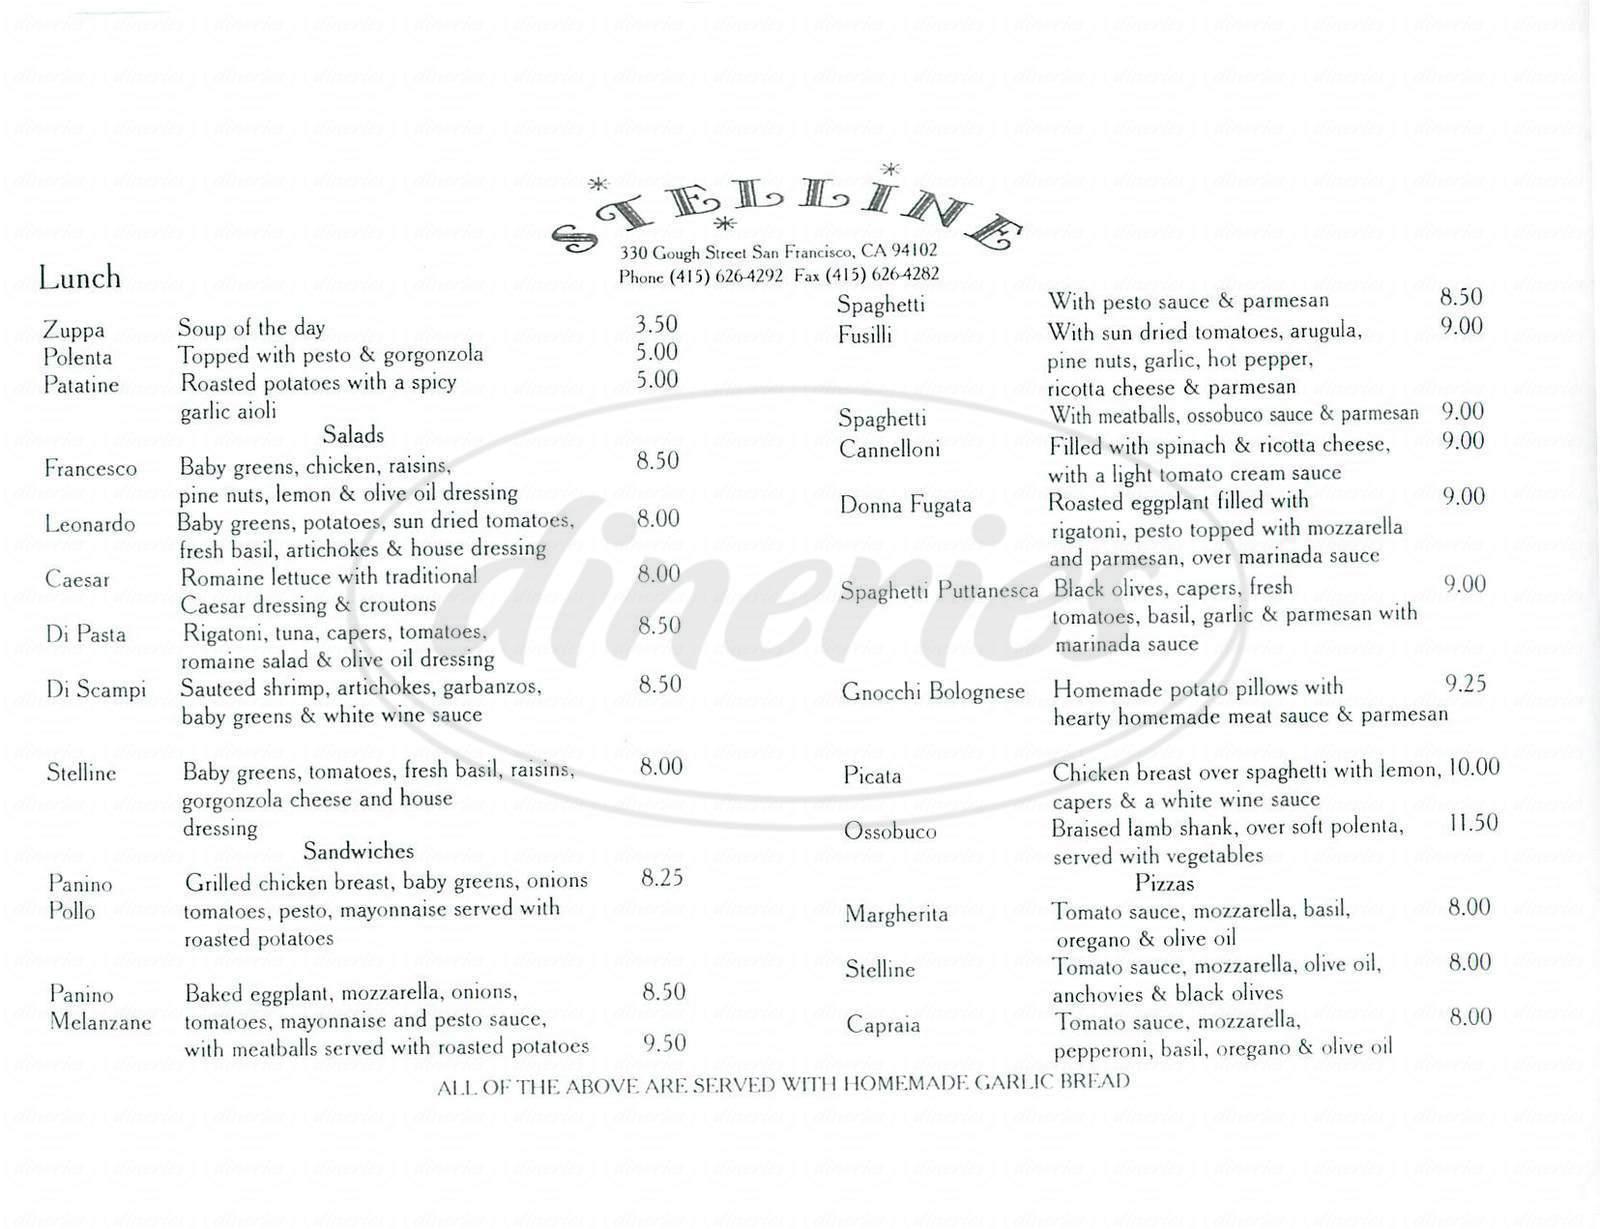 menu for Stelline